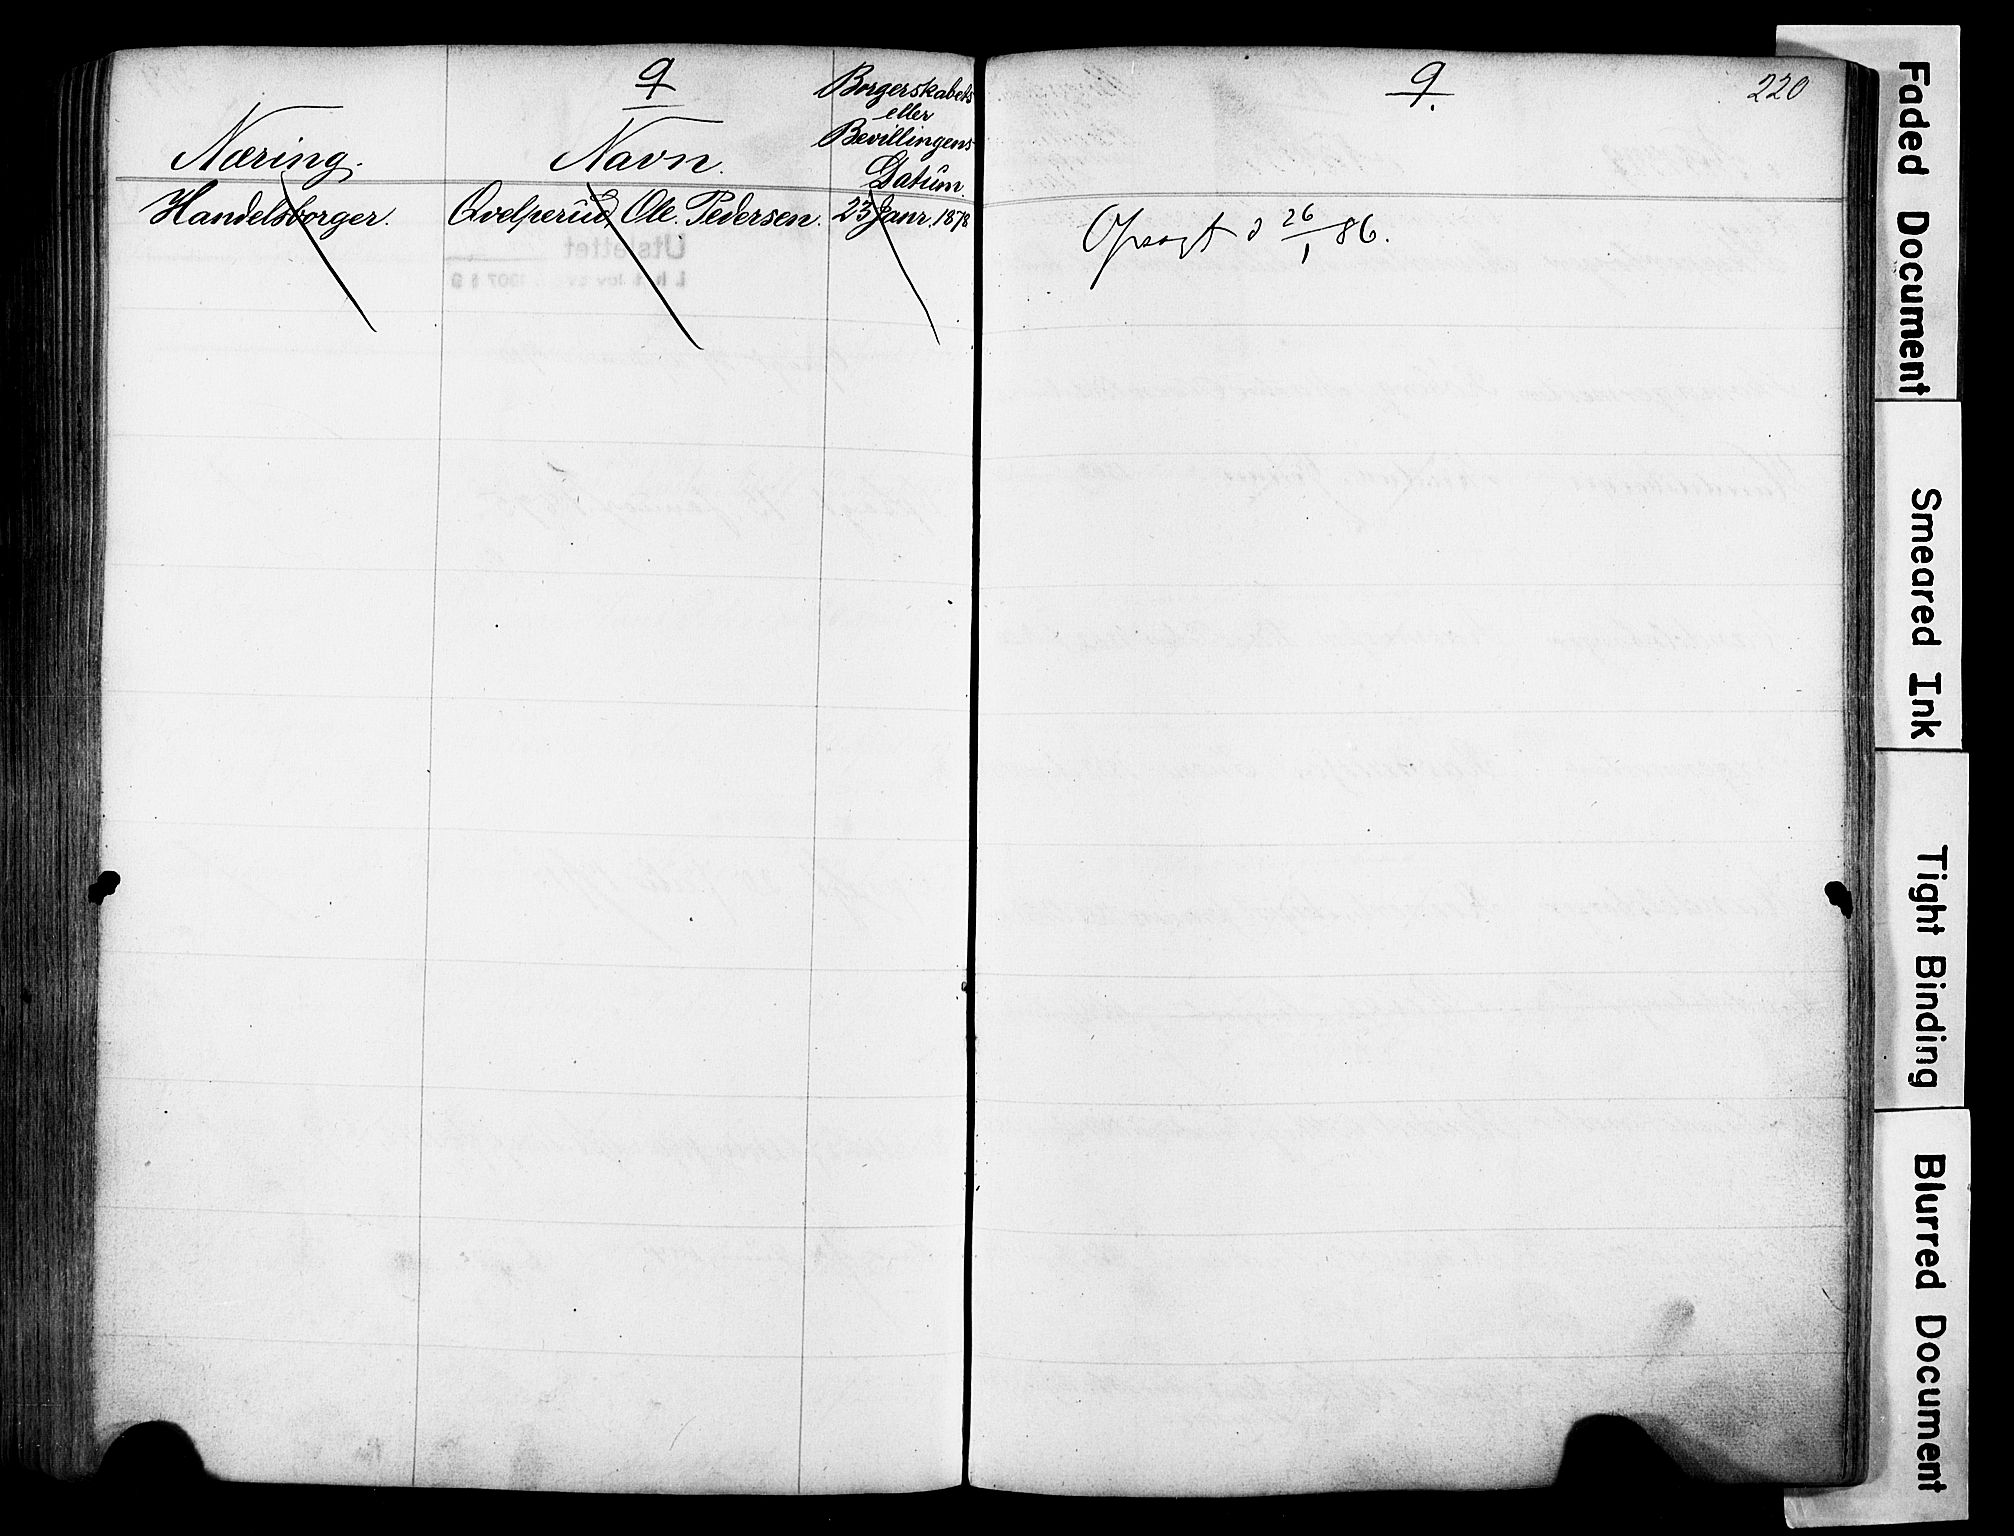 SAO, Kristiania magistrat, F/Fb/L0004: Borgerrulle, 1860-1879, s. 222